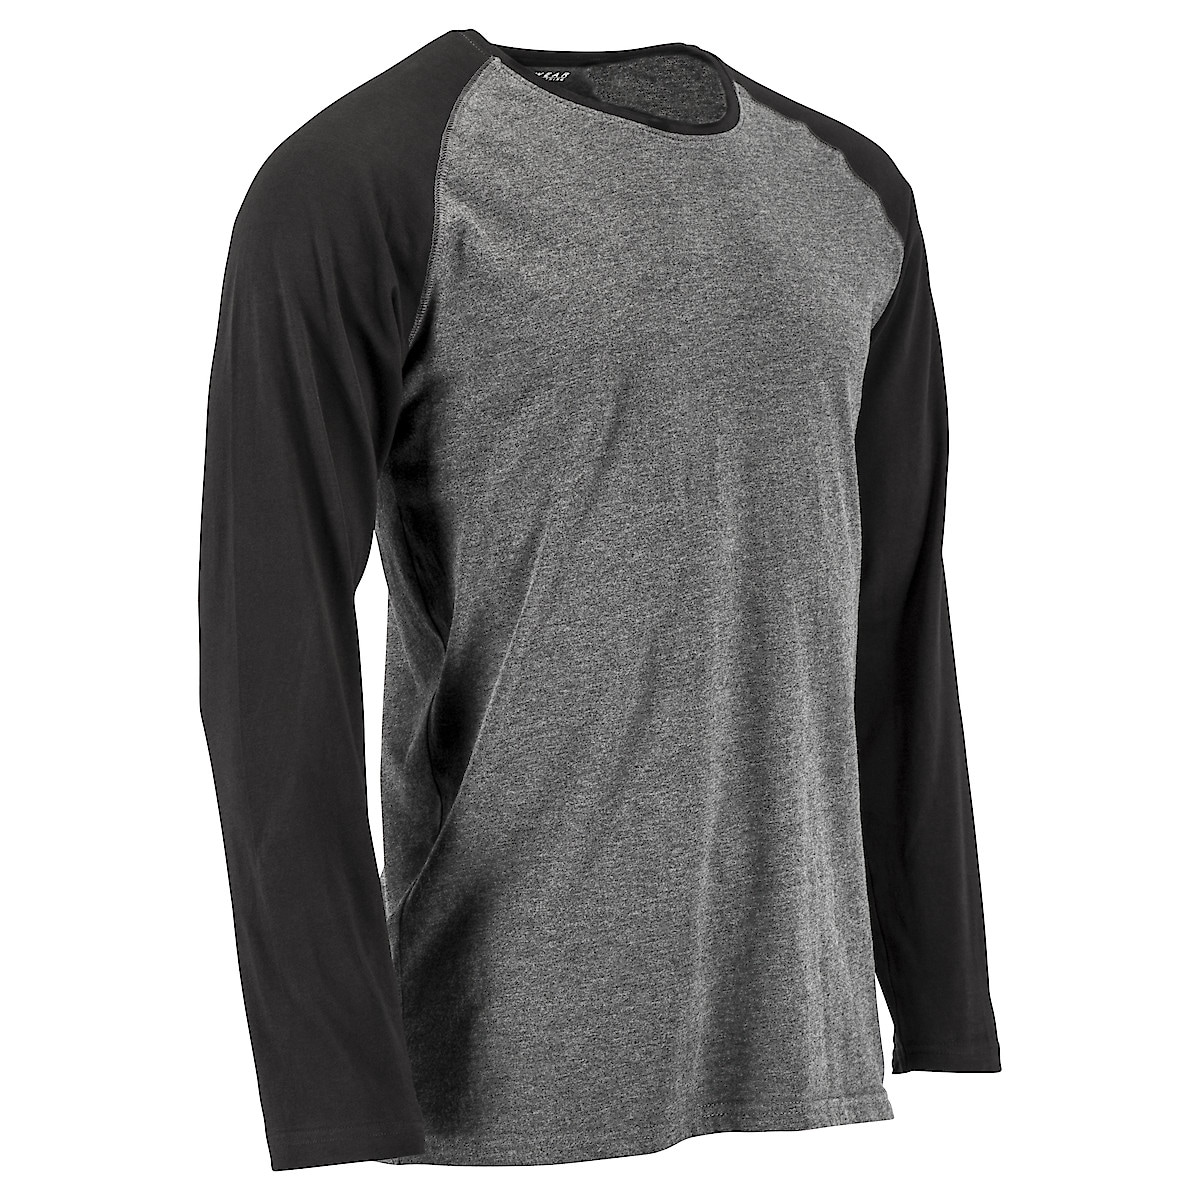 Långärmad t-shirt grå/svart